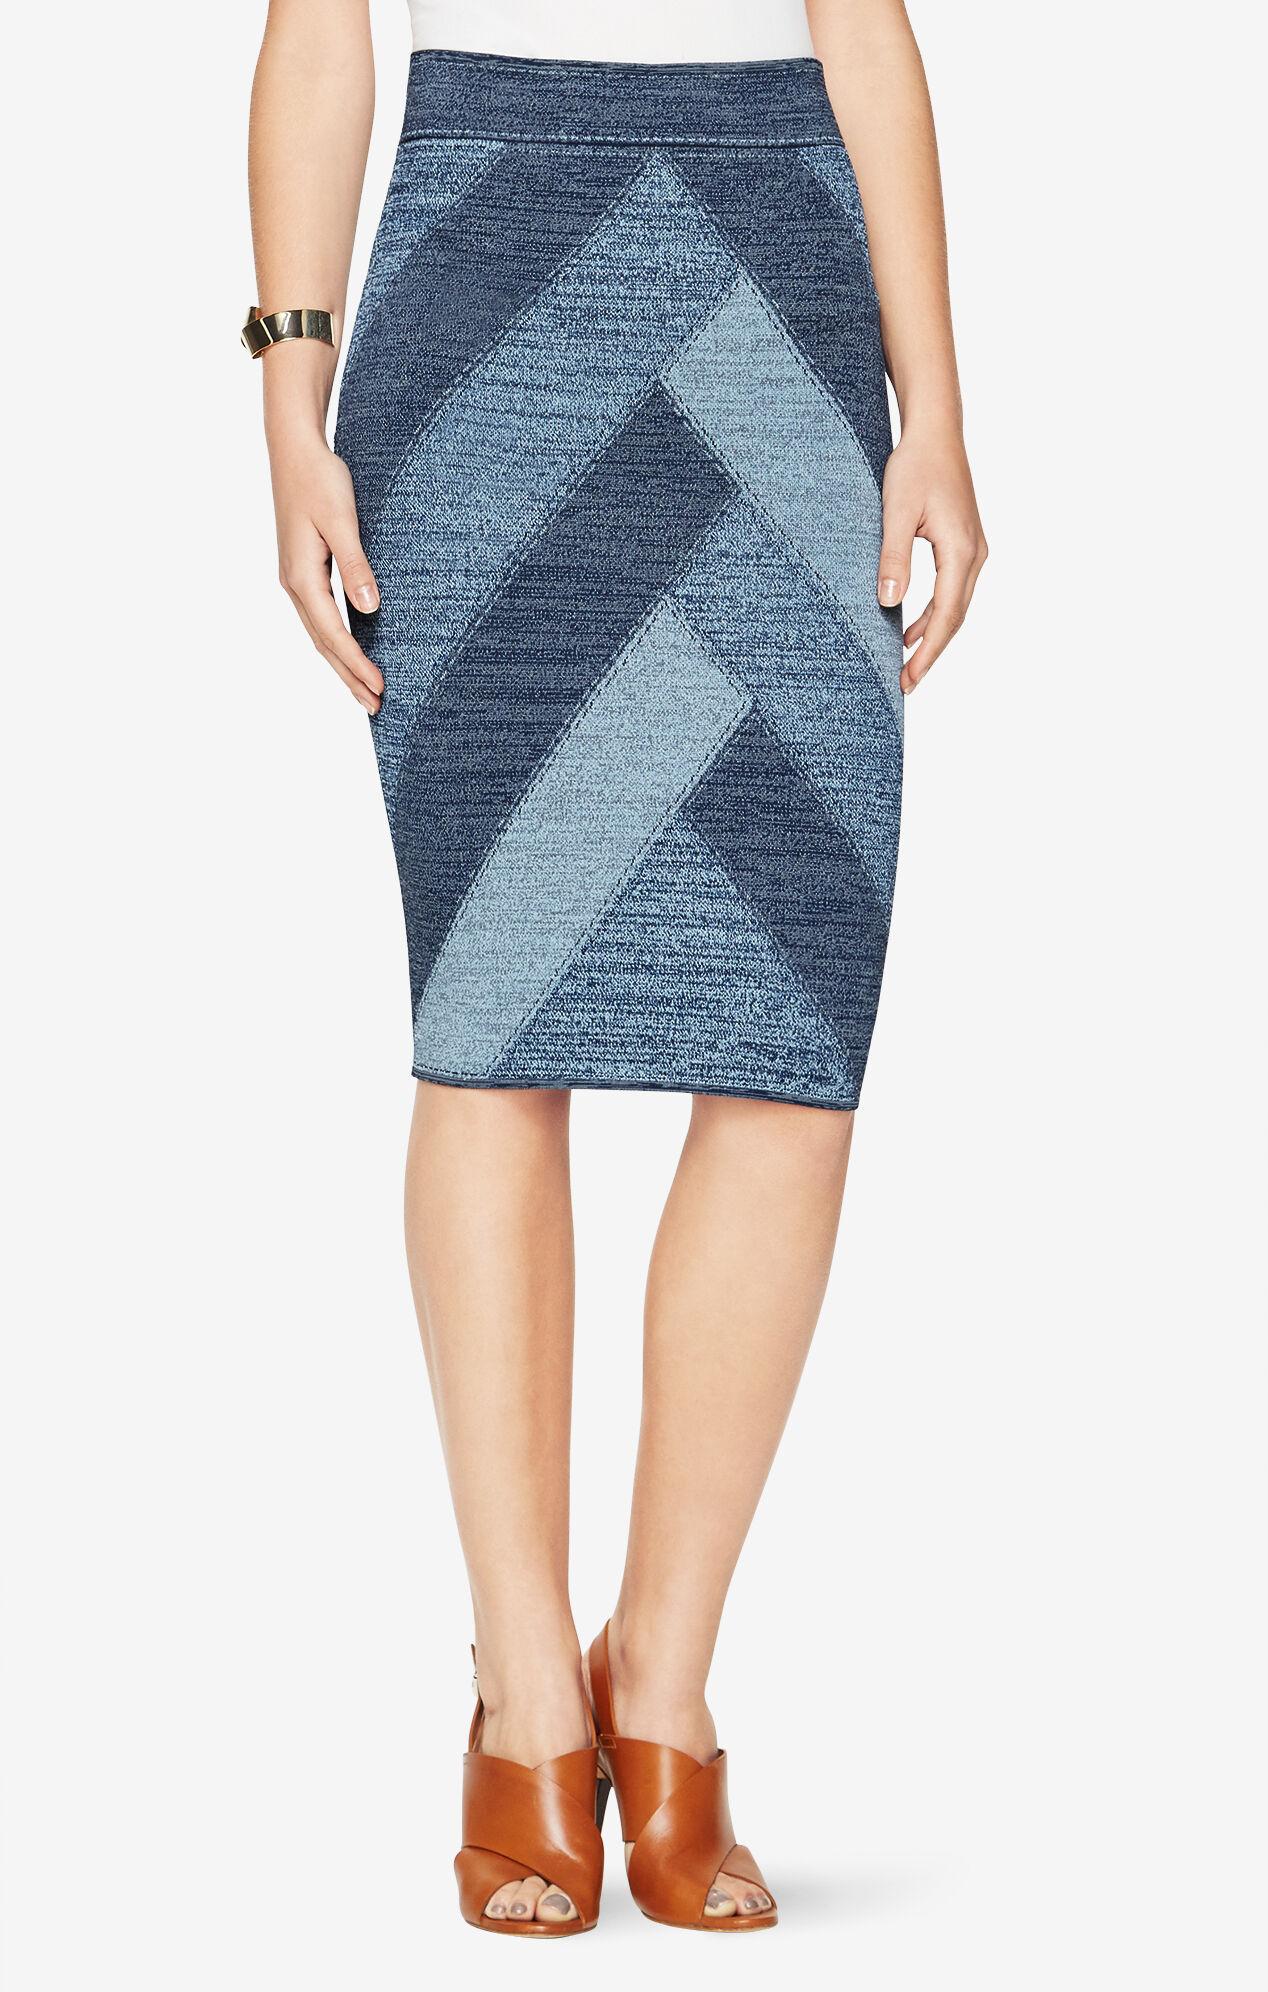 Patchwork Pencil Skirt